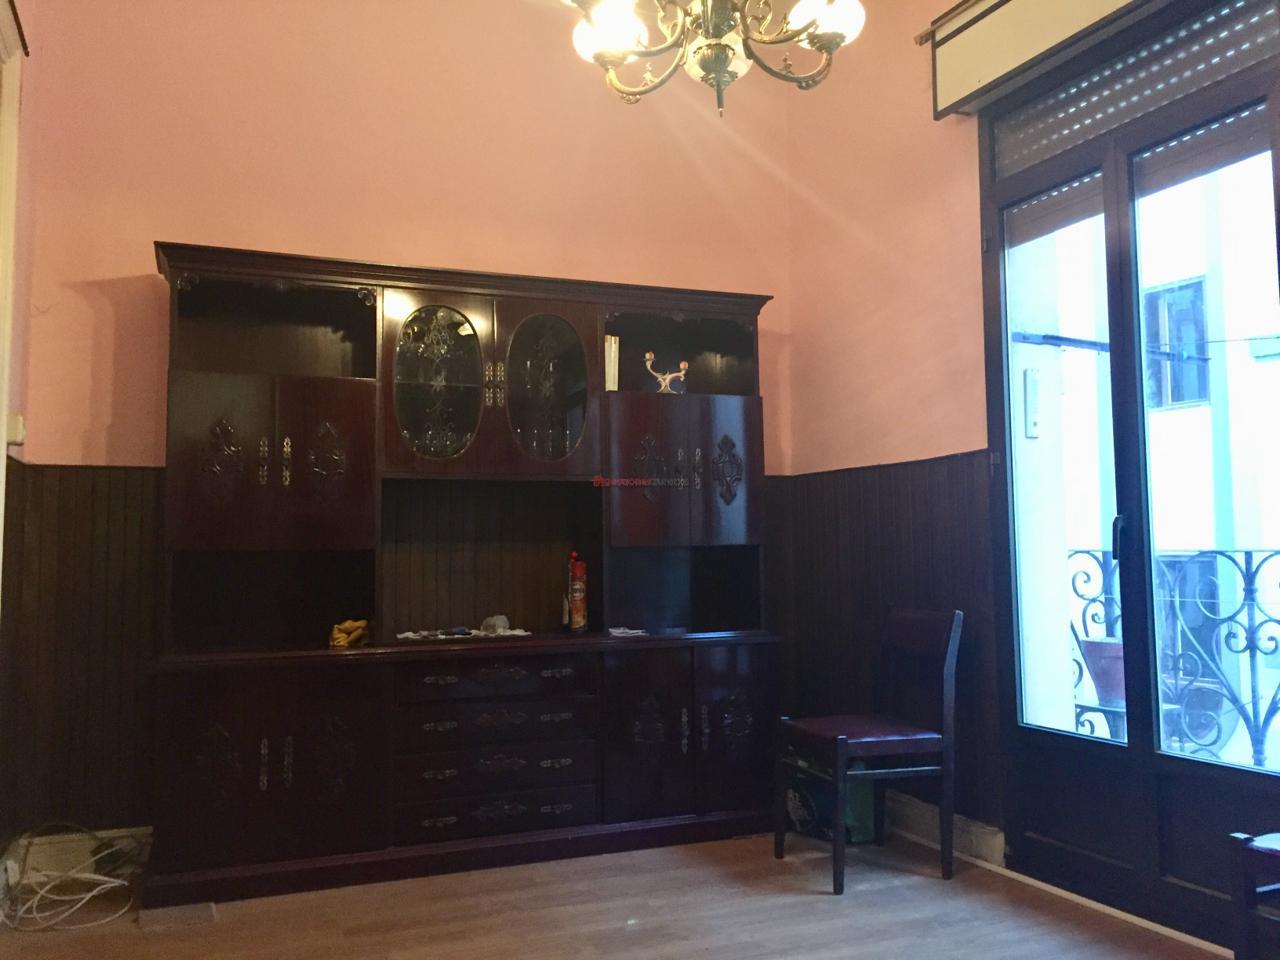 Gestiones zuretxe inmobiliaria en bilbao y gran bilbao for Piso kirikino bilbao